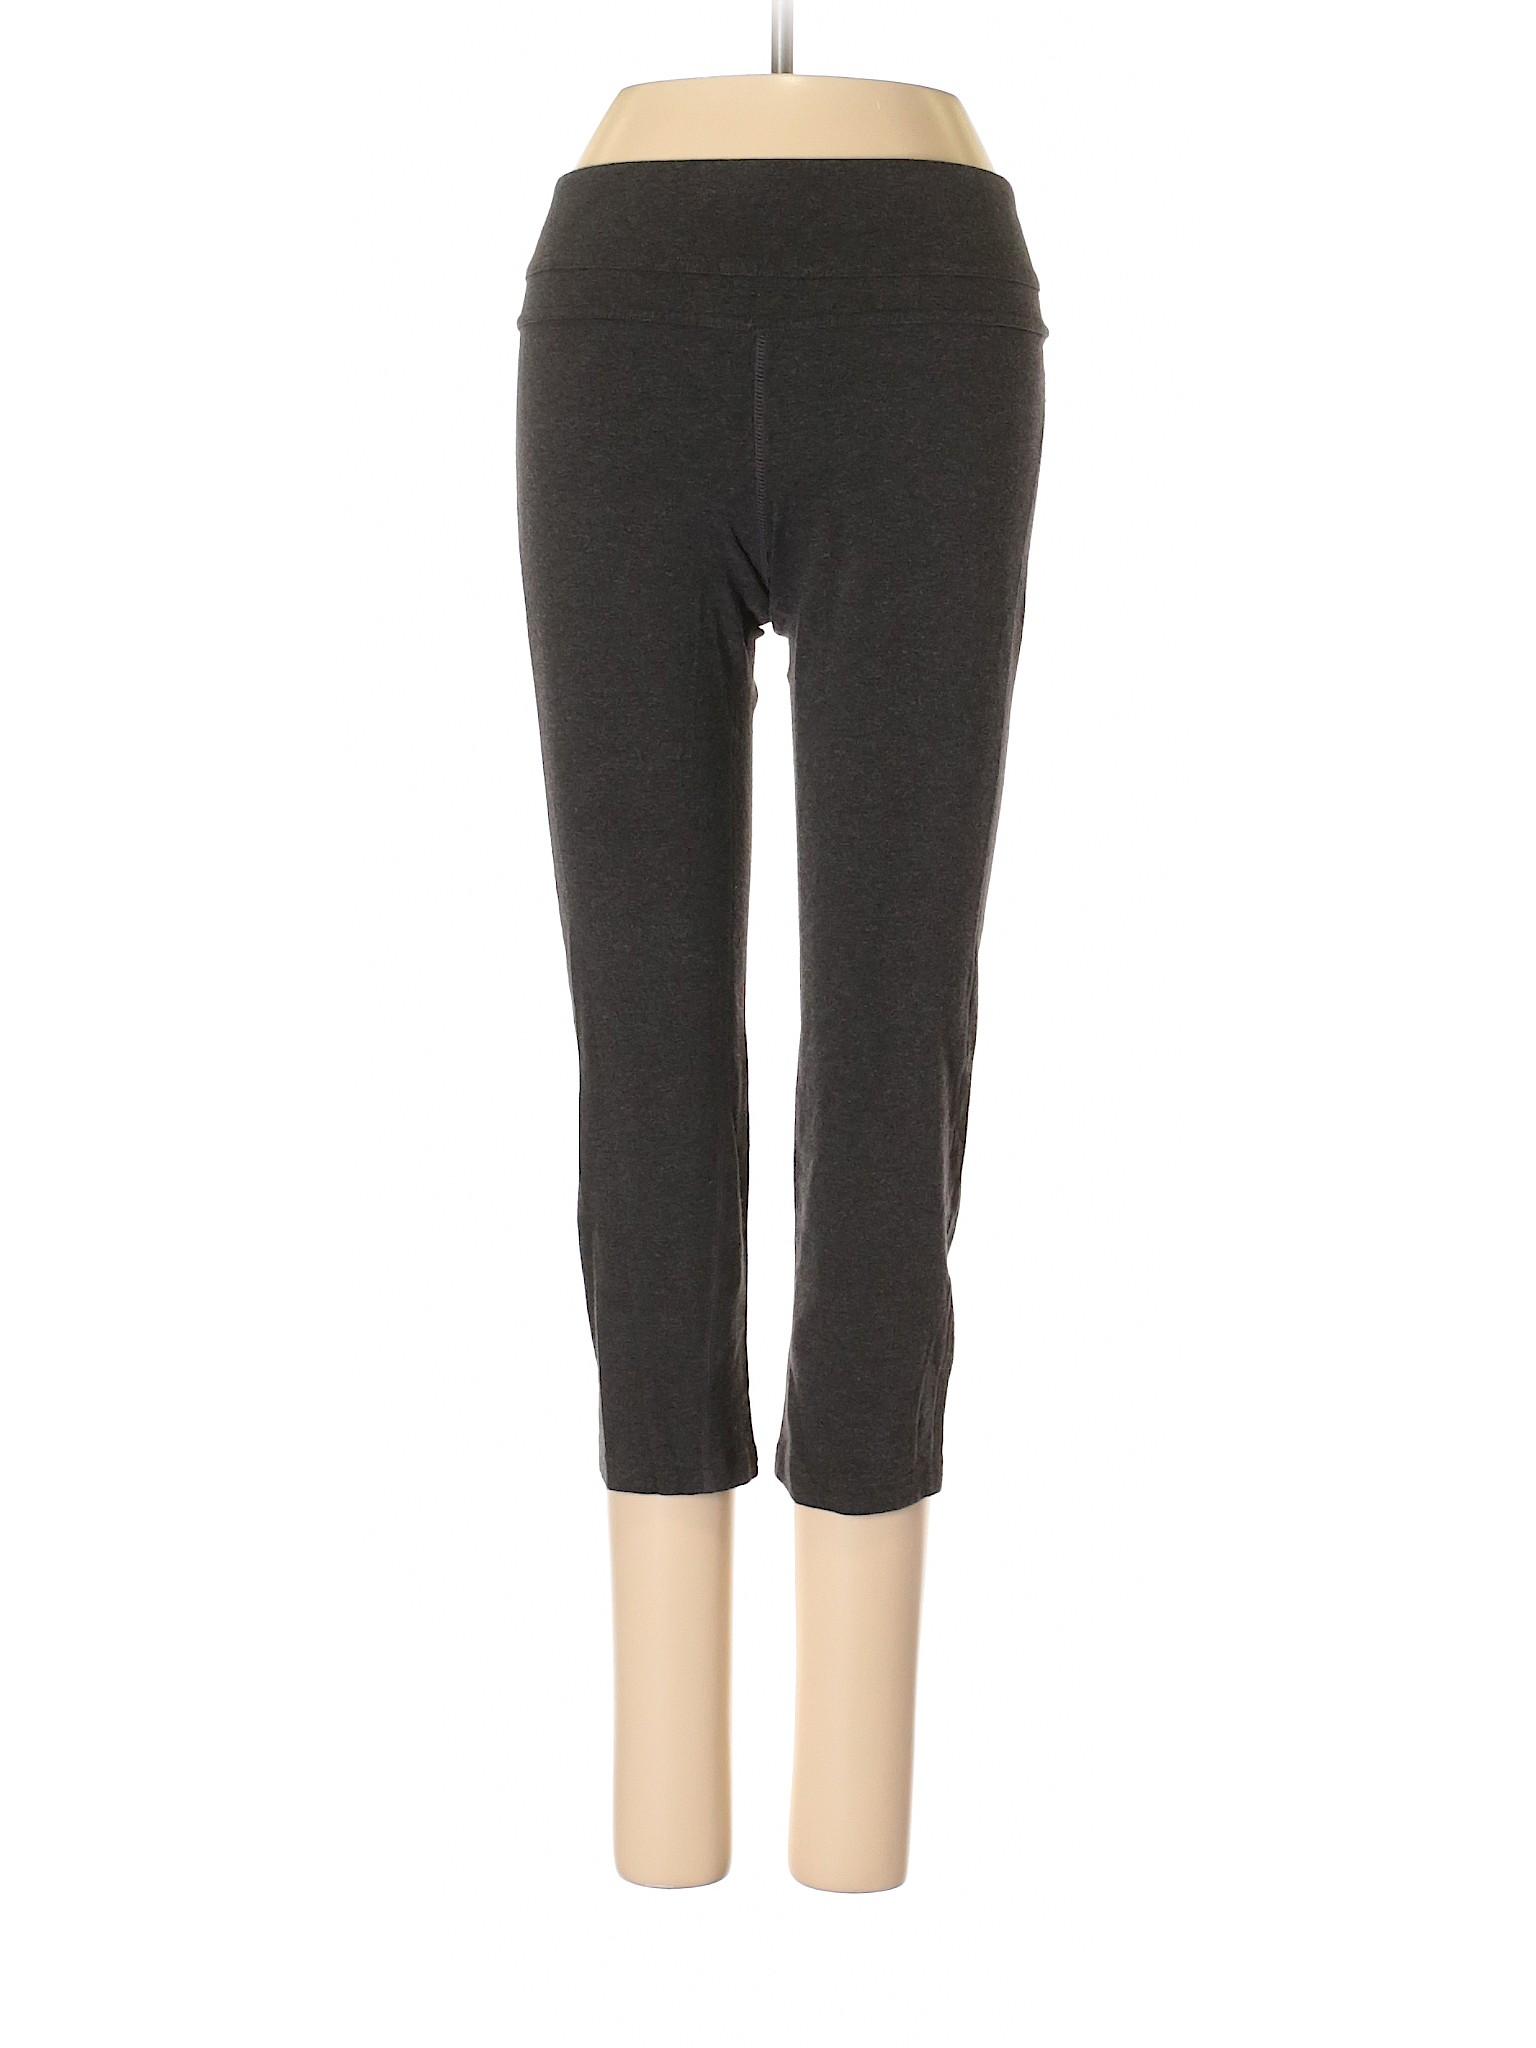 leisure Boutique Fit Active Pants Gap paOvqdrna